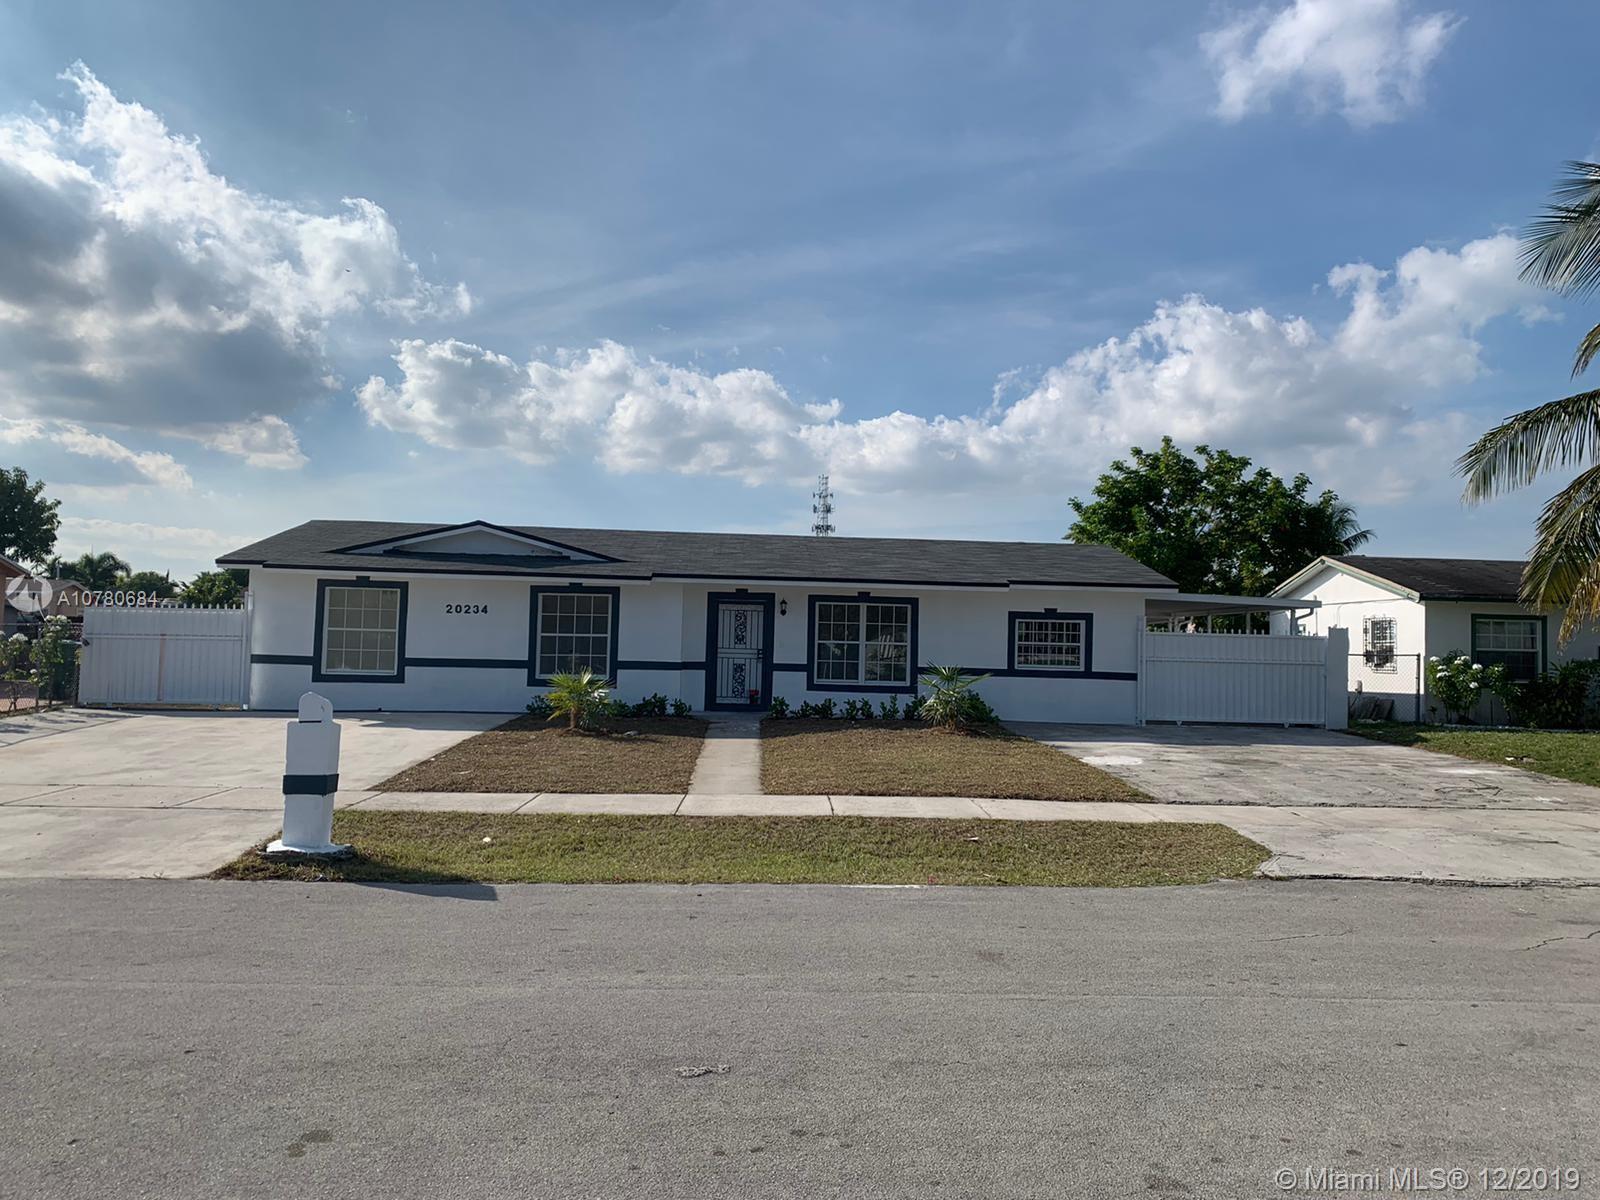 20234 NW 32nd Ct, Miami Gardens, FL 33056